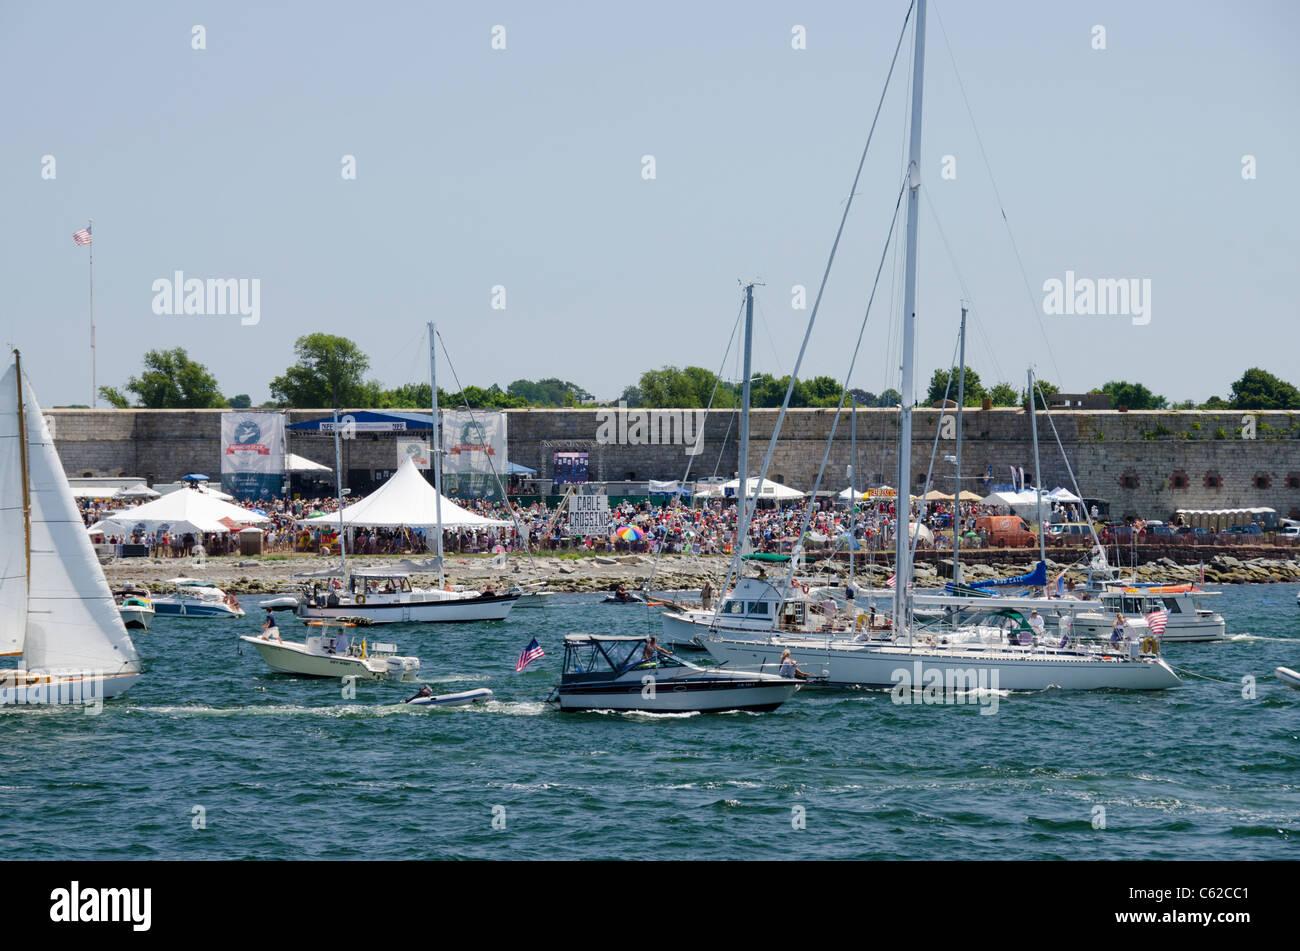 Rhode Island, Newport. Annual Newport Folk Festival held at Fort Adams State Park. - Stock Image